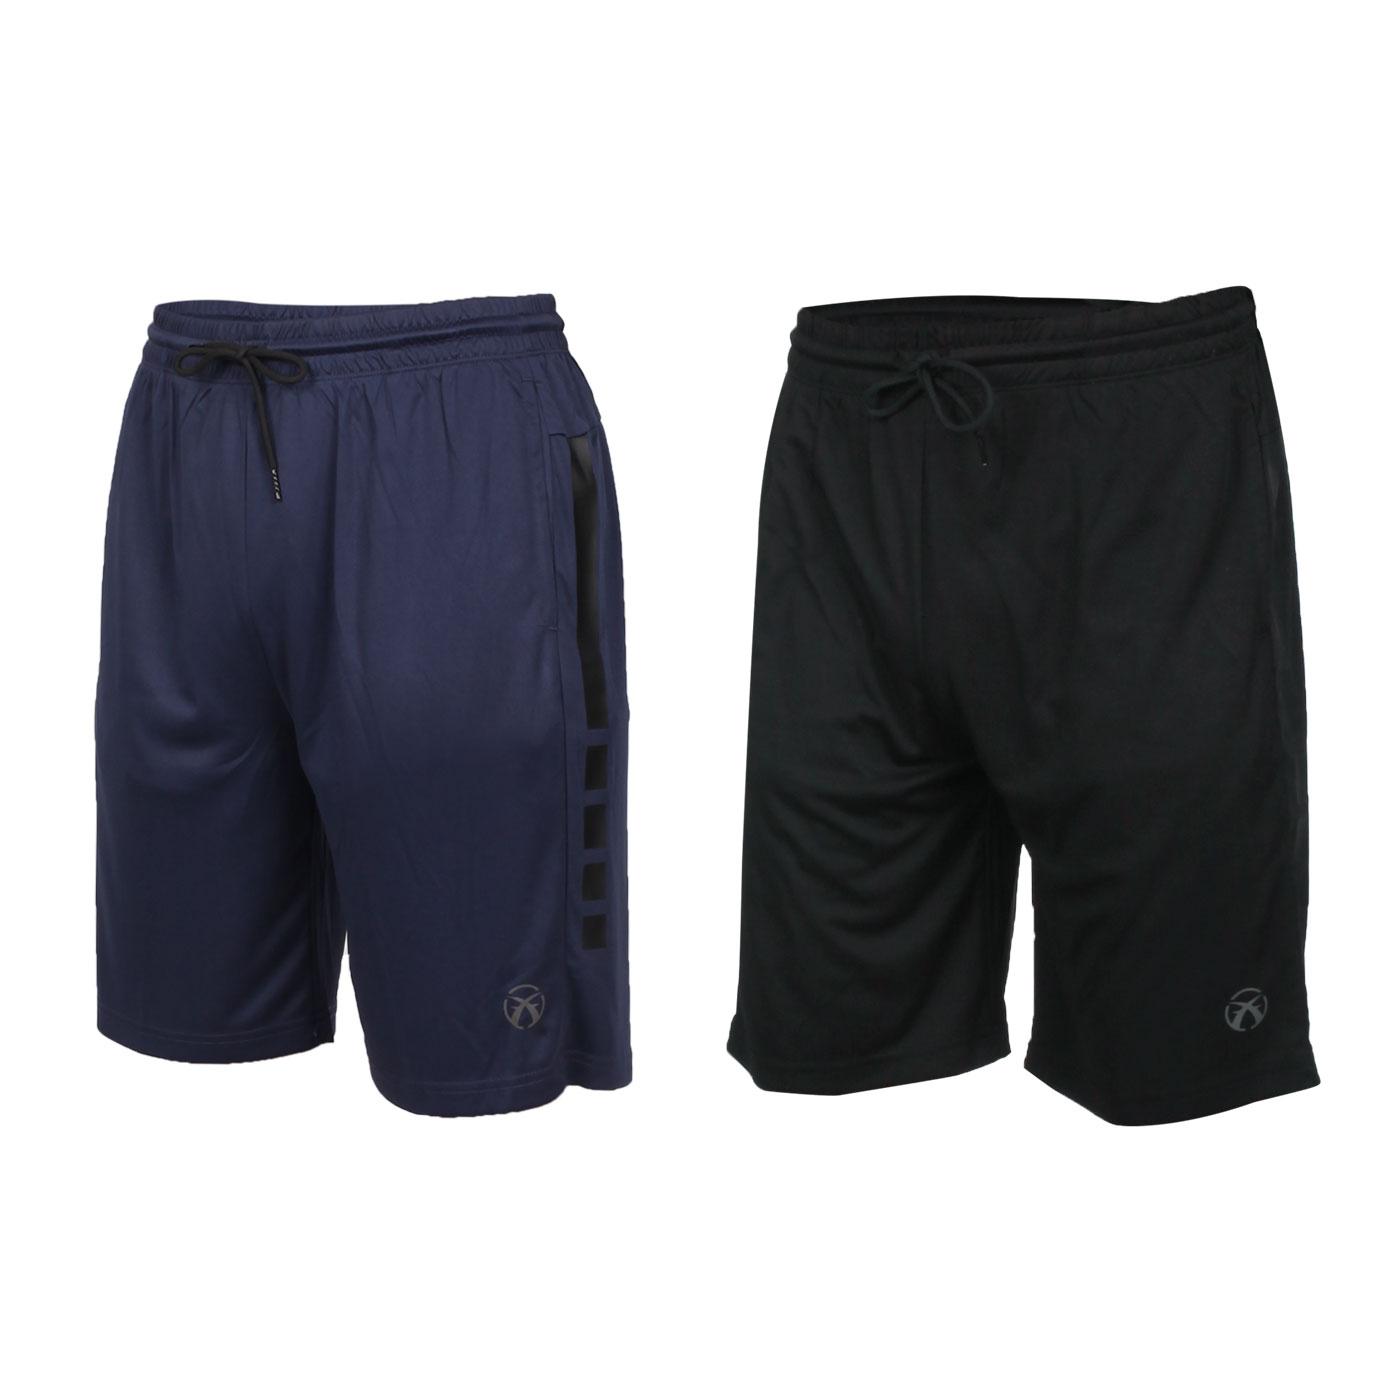 FIRESTAR 男款吸排訓練籃球褲 B0501-10